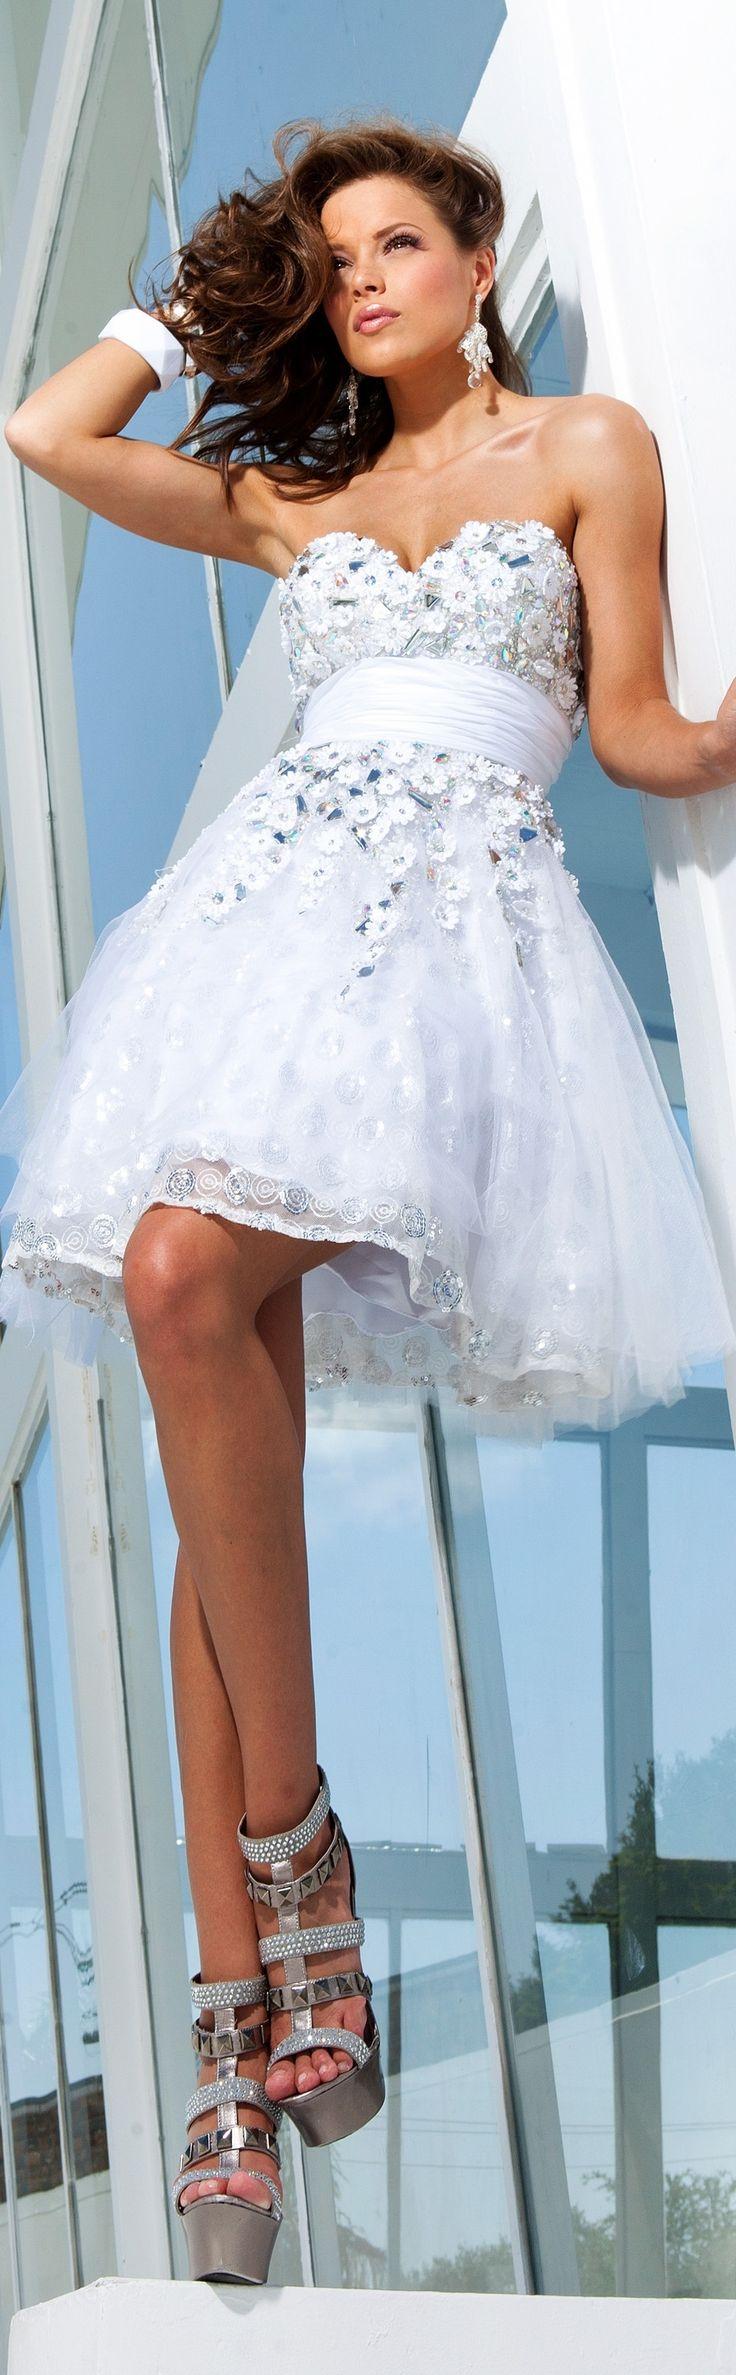 157 best Destination Beach Weddings images on Pinterest | Wedding ...